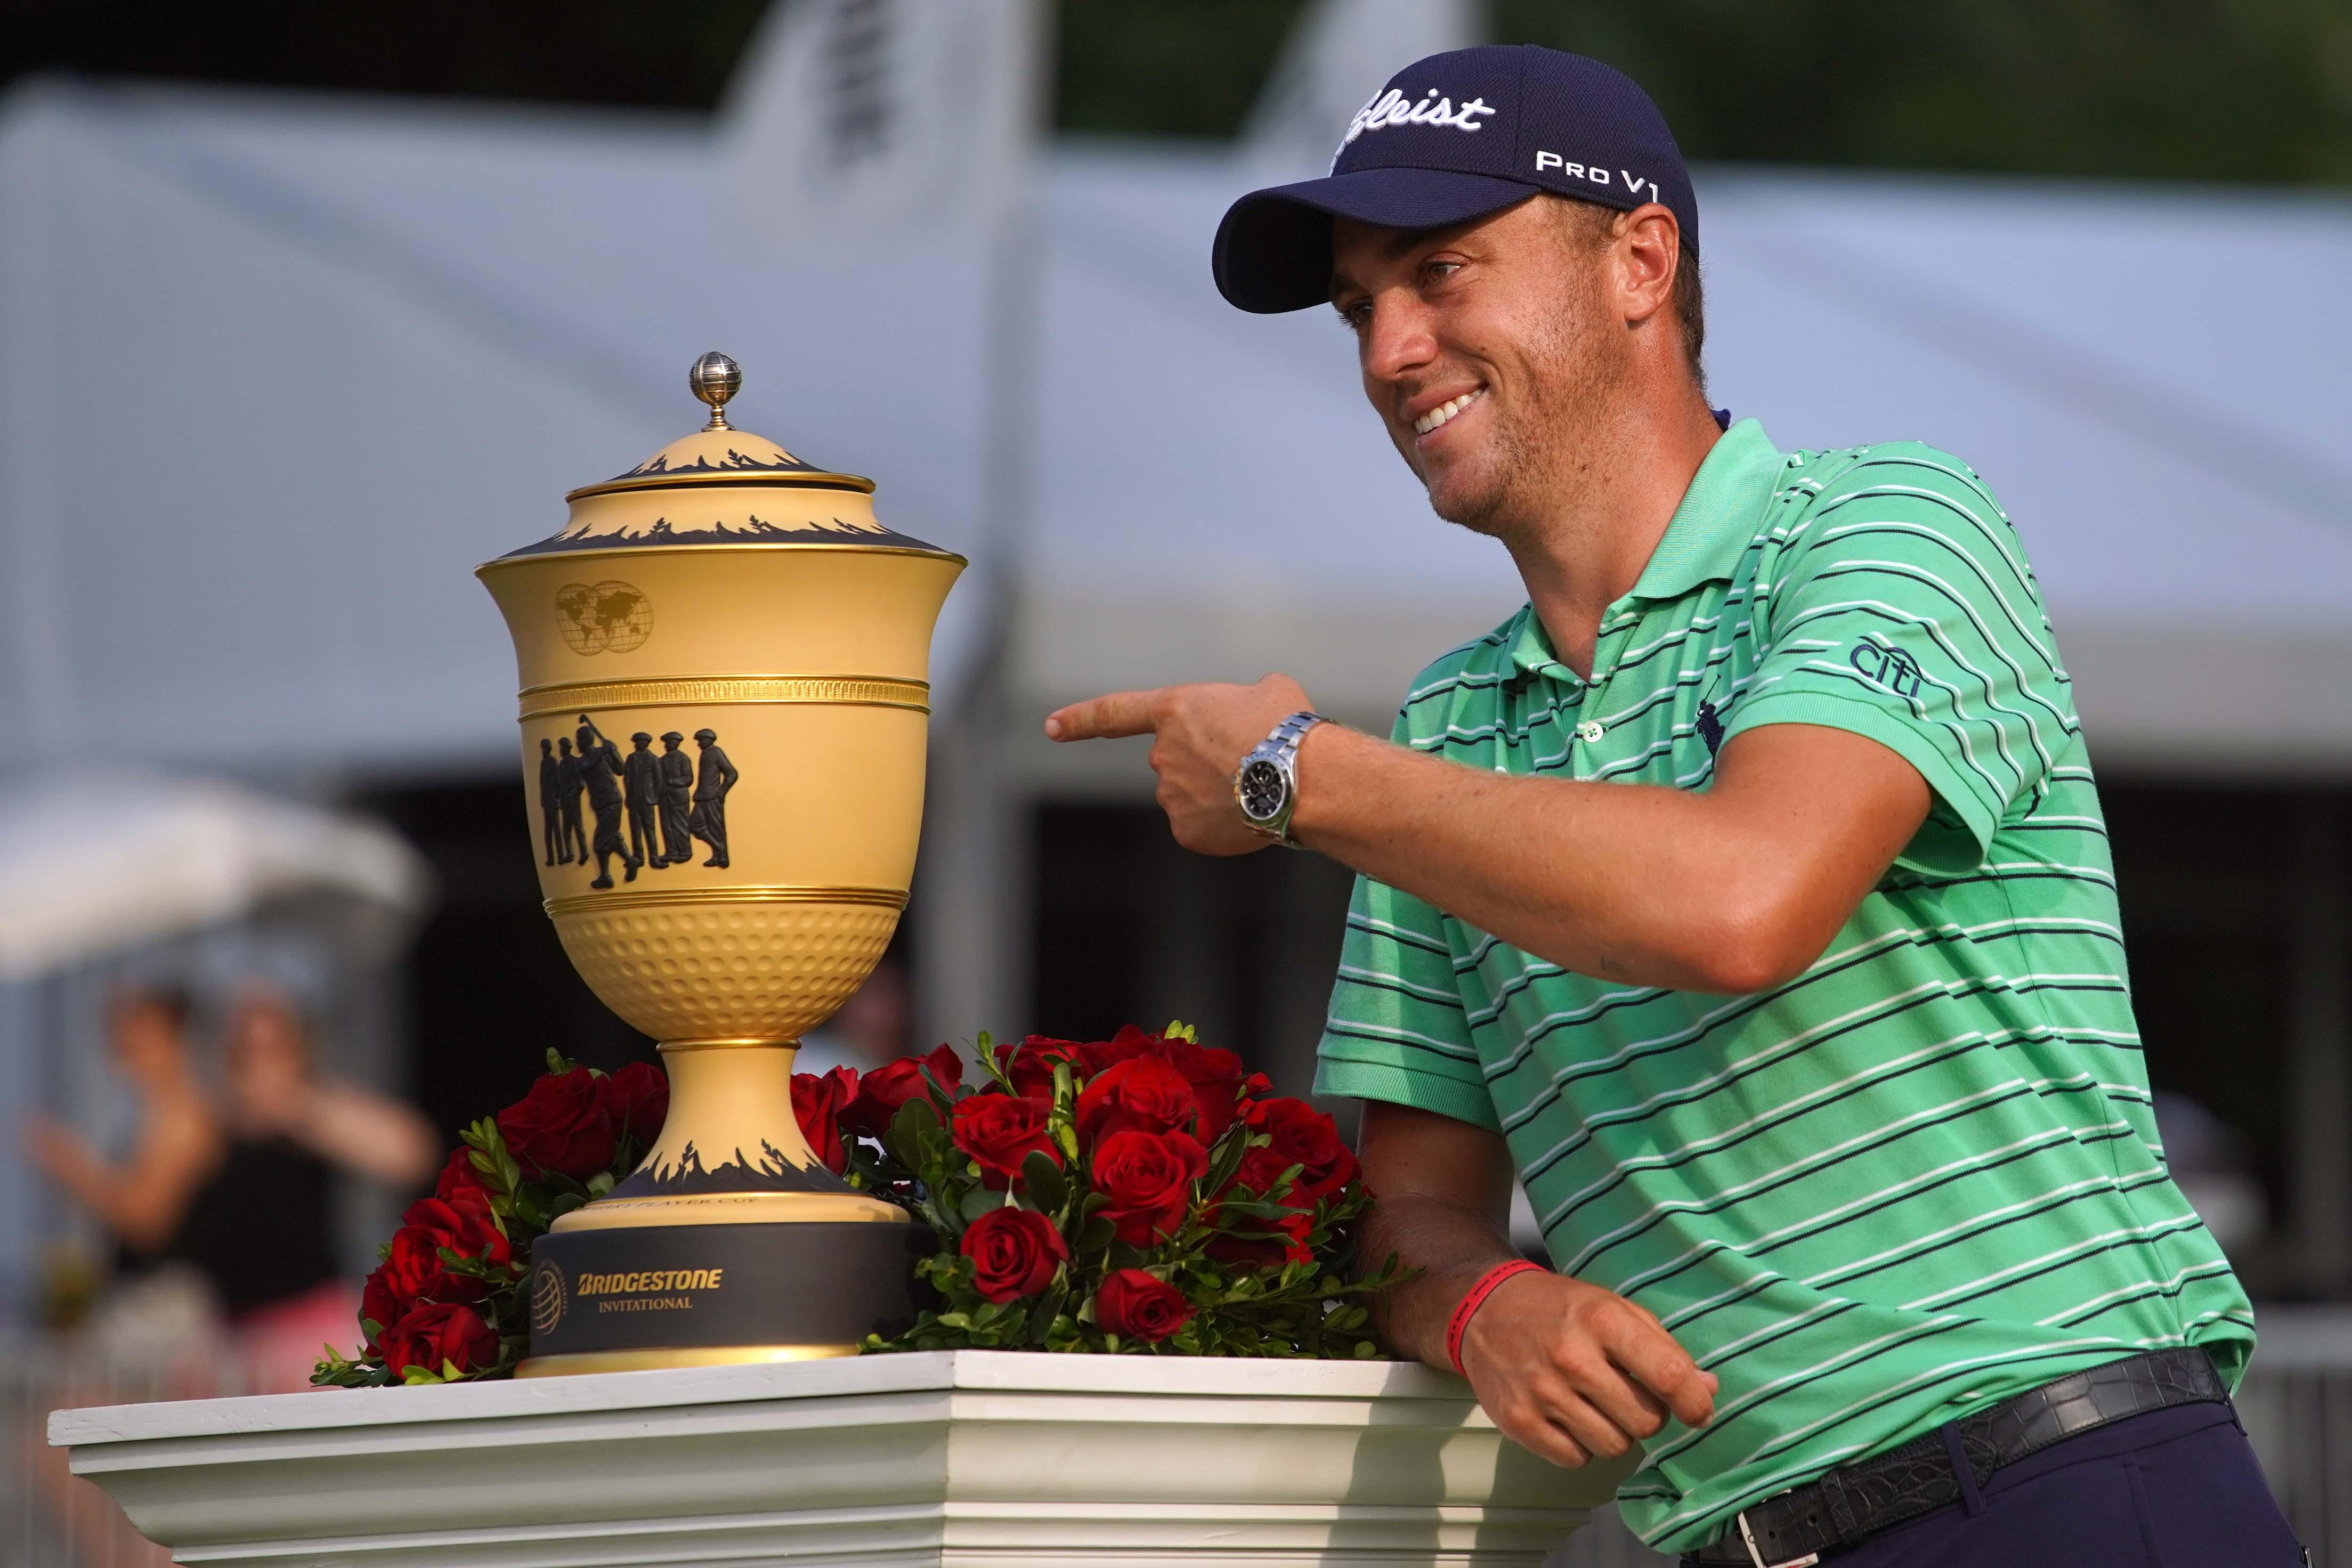 PGA: WGC - Bridgestone Invitational - Final Round